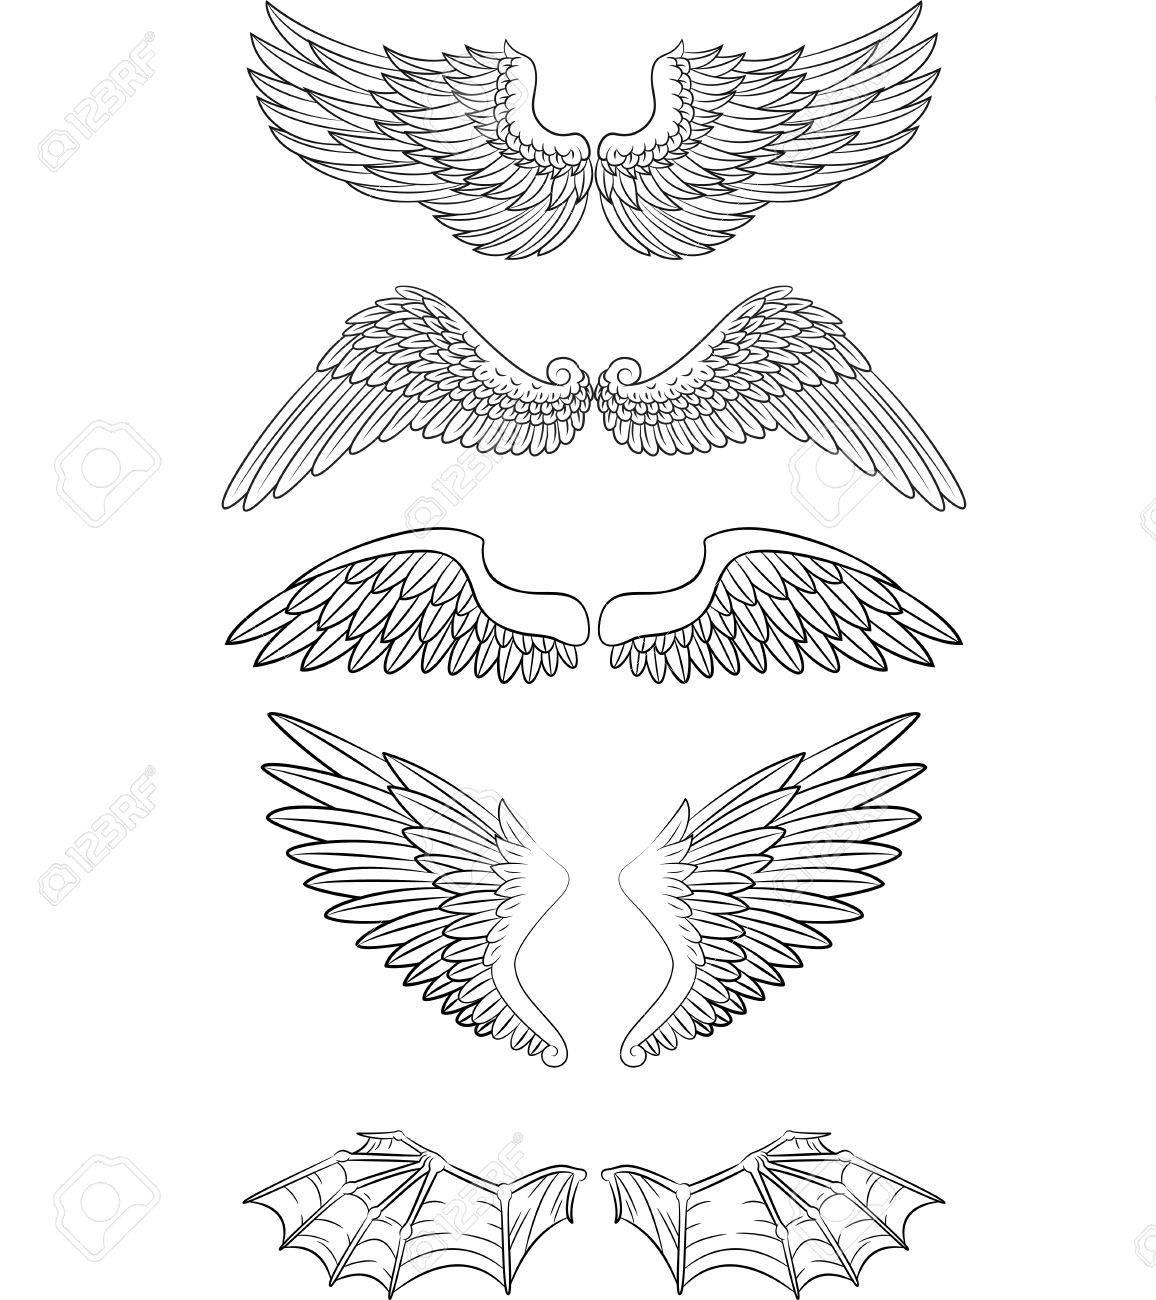 cartoon angel wings collection set royalty free cliparts vectors rh 123rf com cartoon angel wings drawing cartoon angel wings png